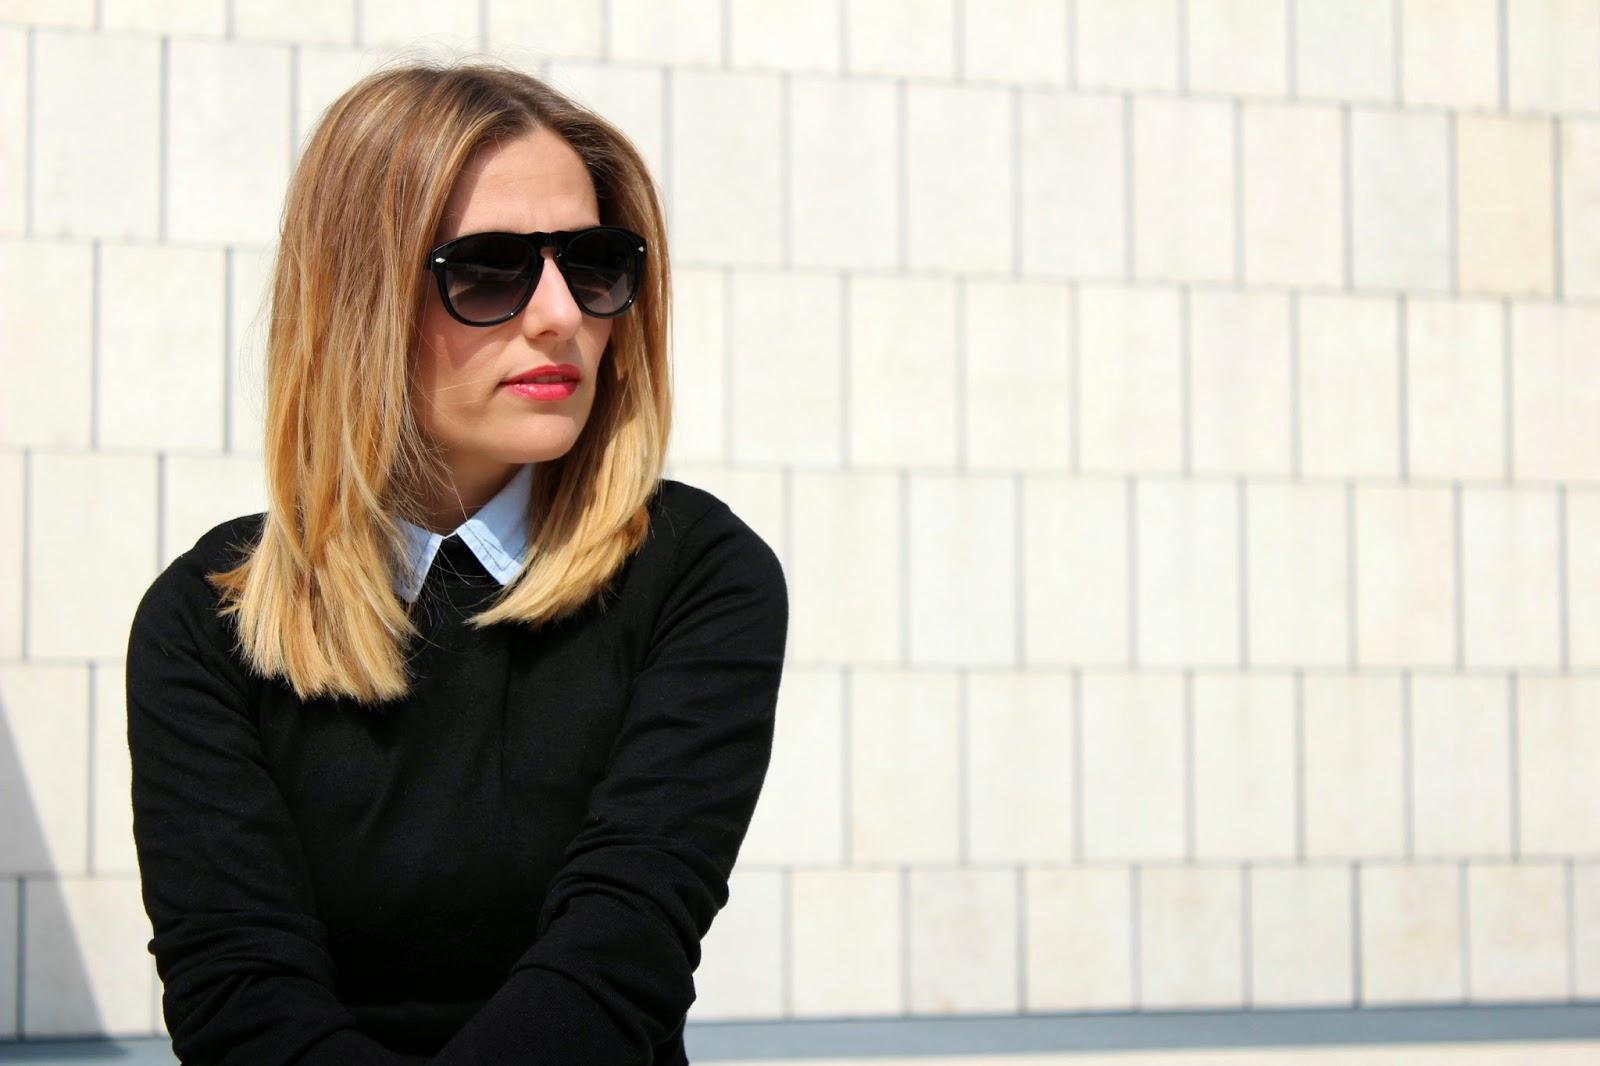 Eniwhere Fashion - NoRain sunglasses